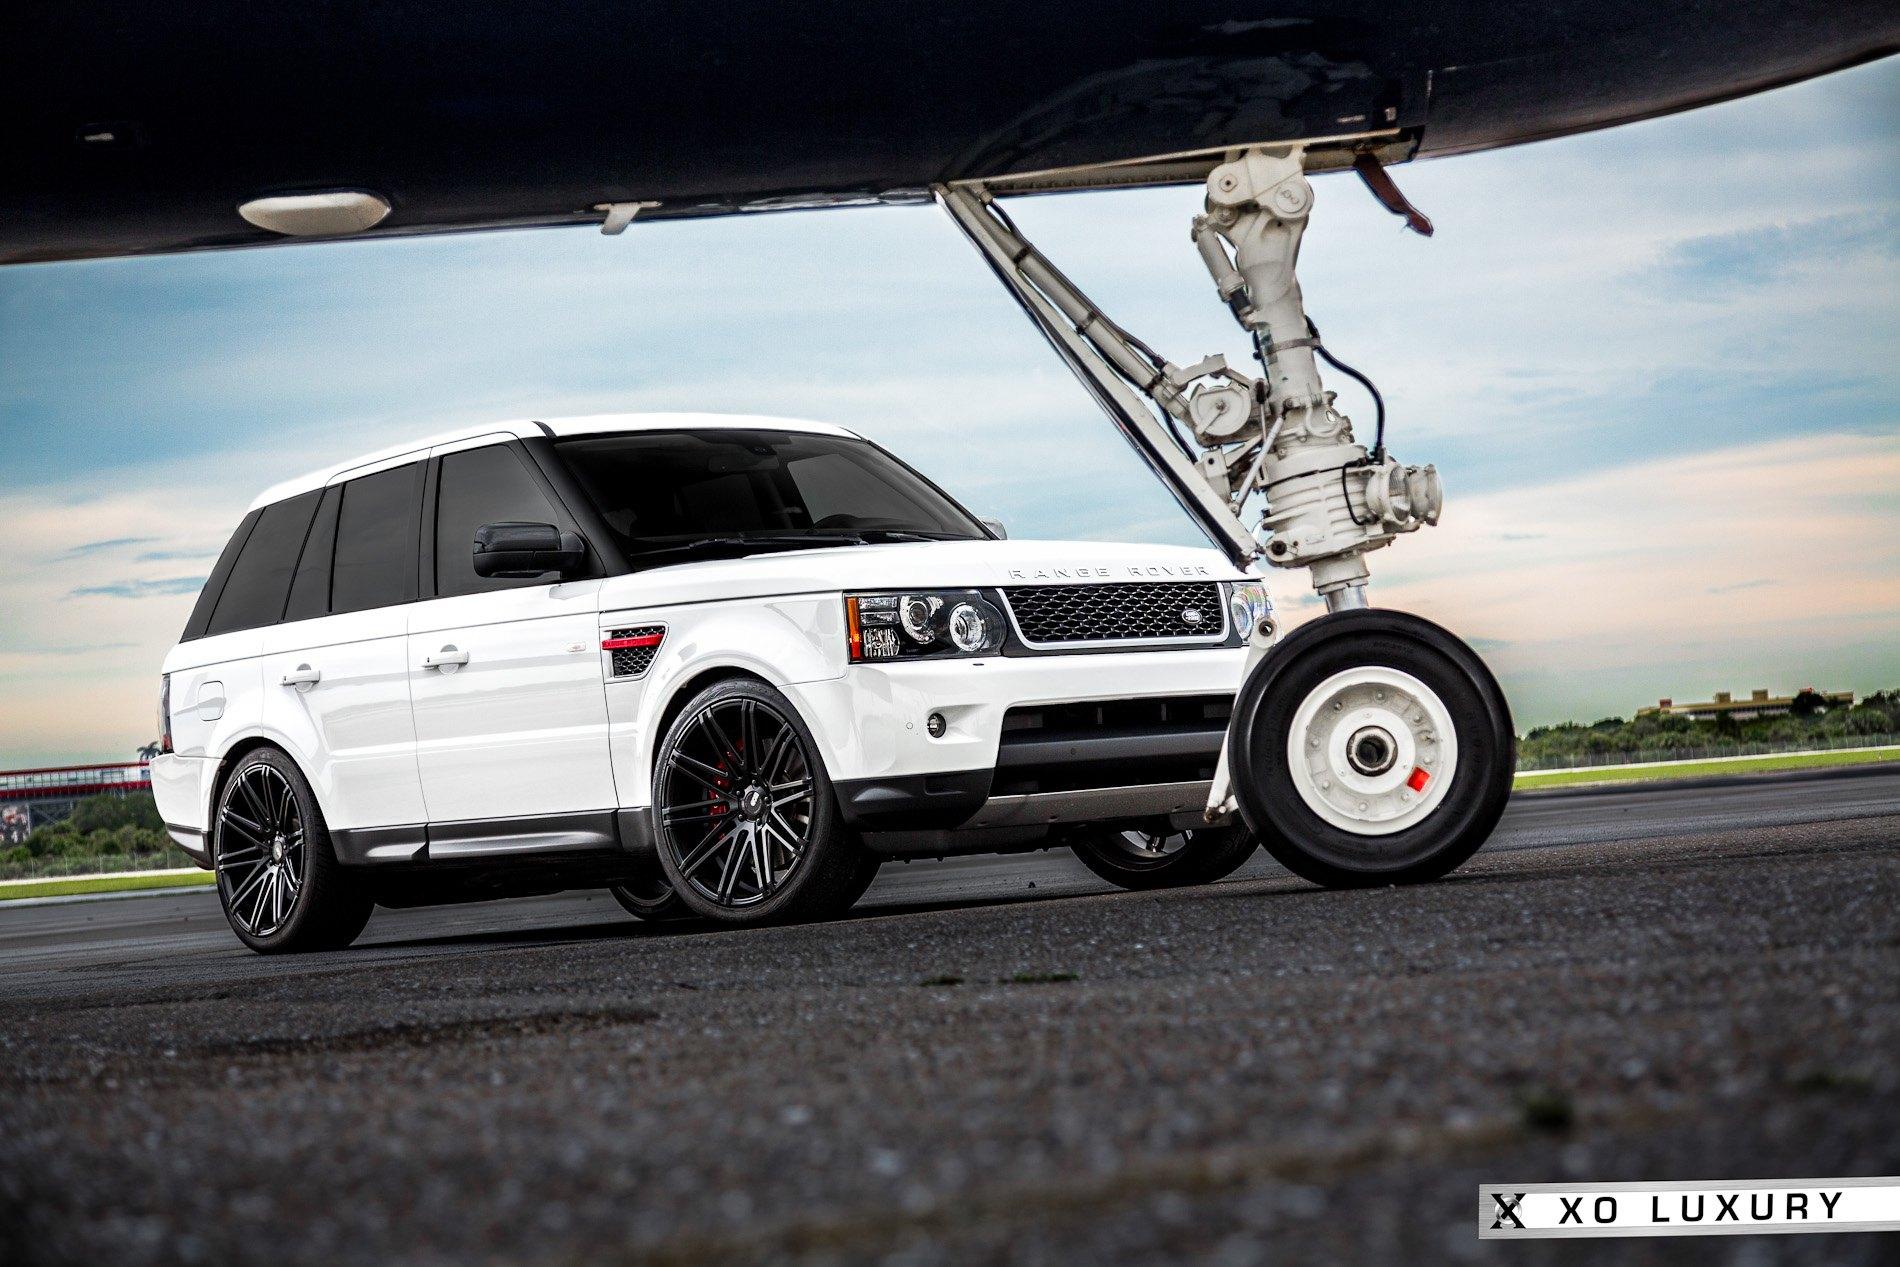 Milan Matte Black Rims By XO Luxury White Range Rover Sport